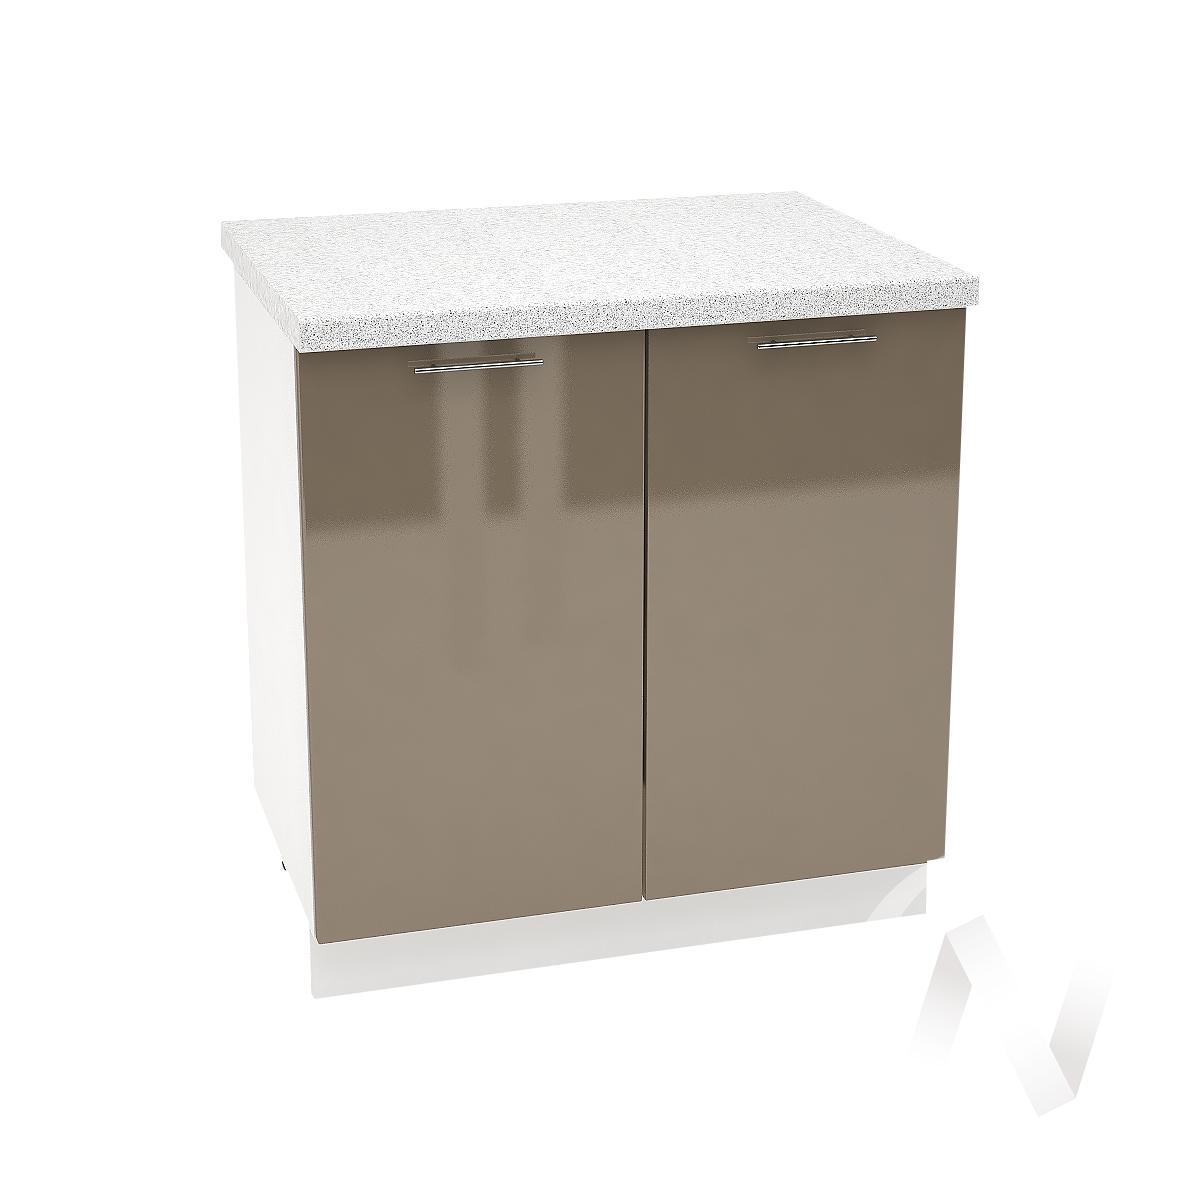 "Кухня ""Валерия-М"": Шкаф нижний 800, ШН 800 (Капучино глянец/корпус белый)"